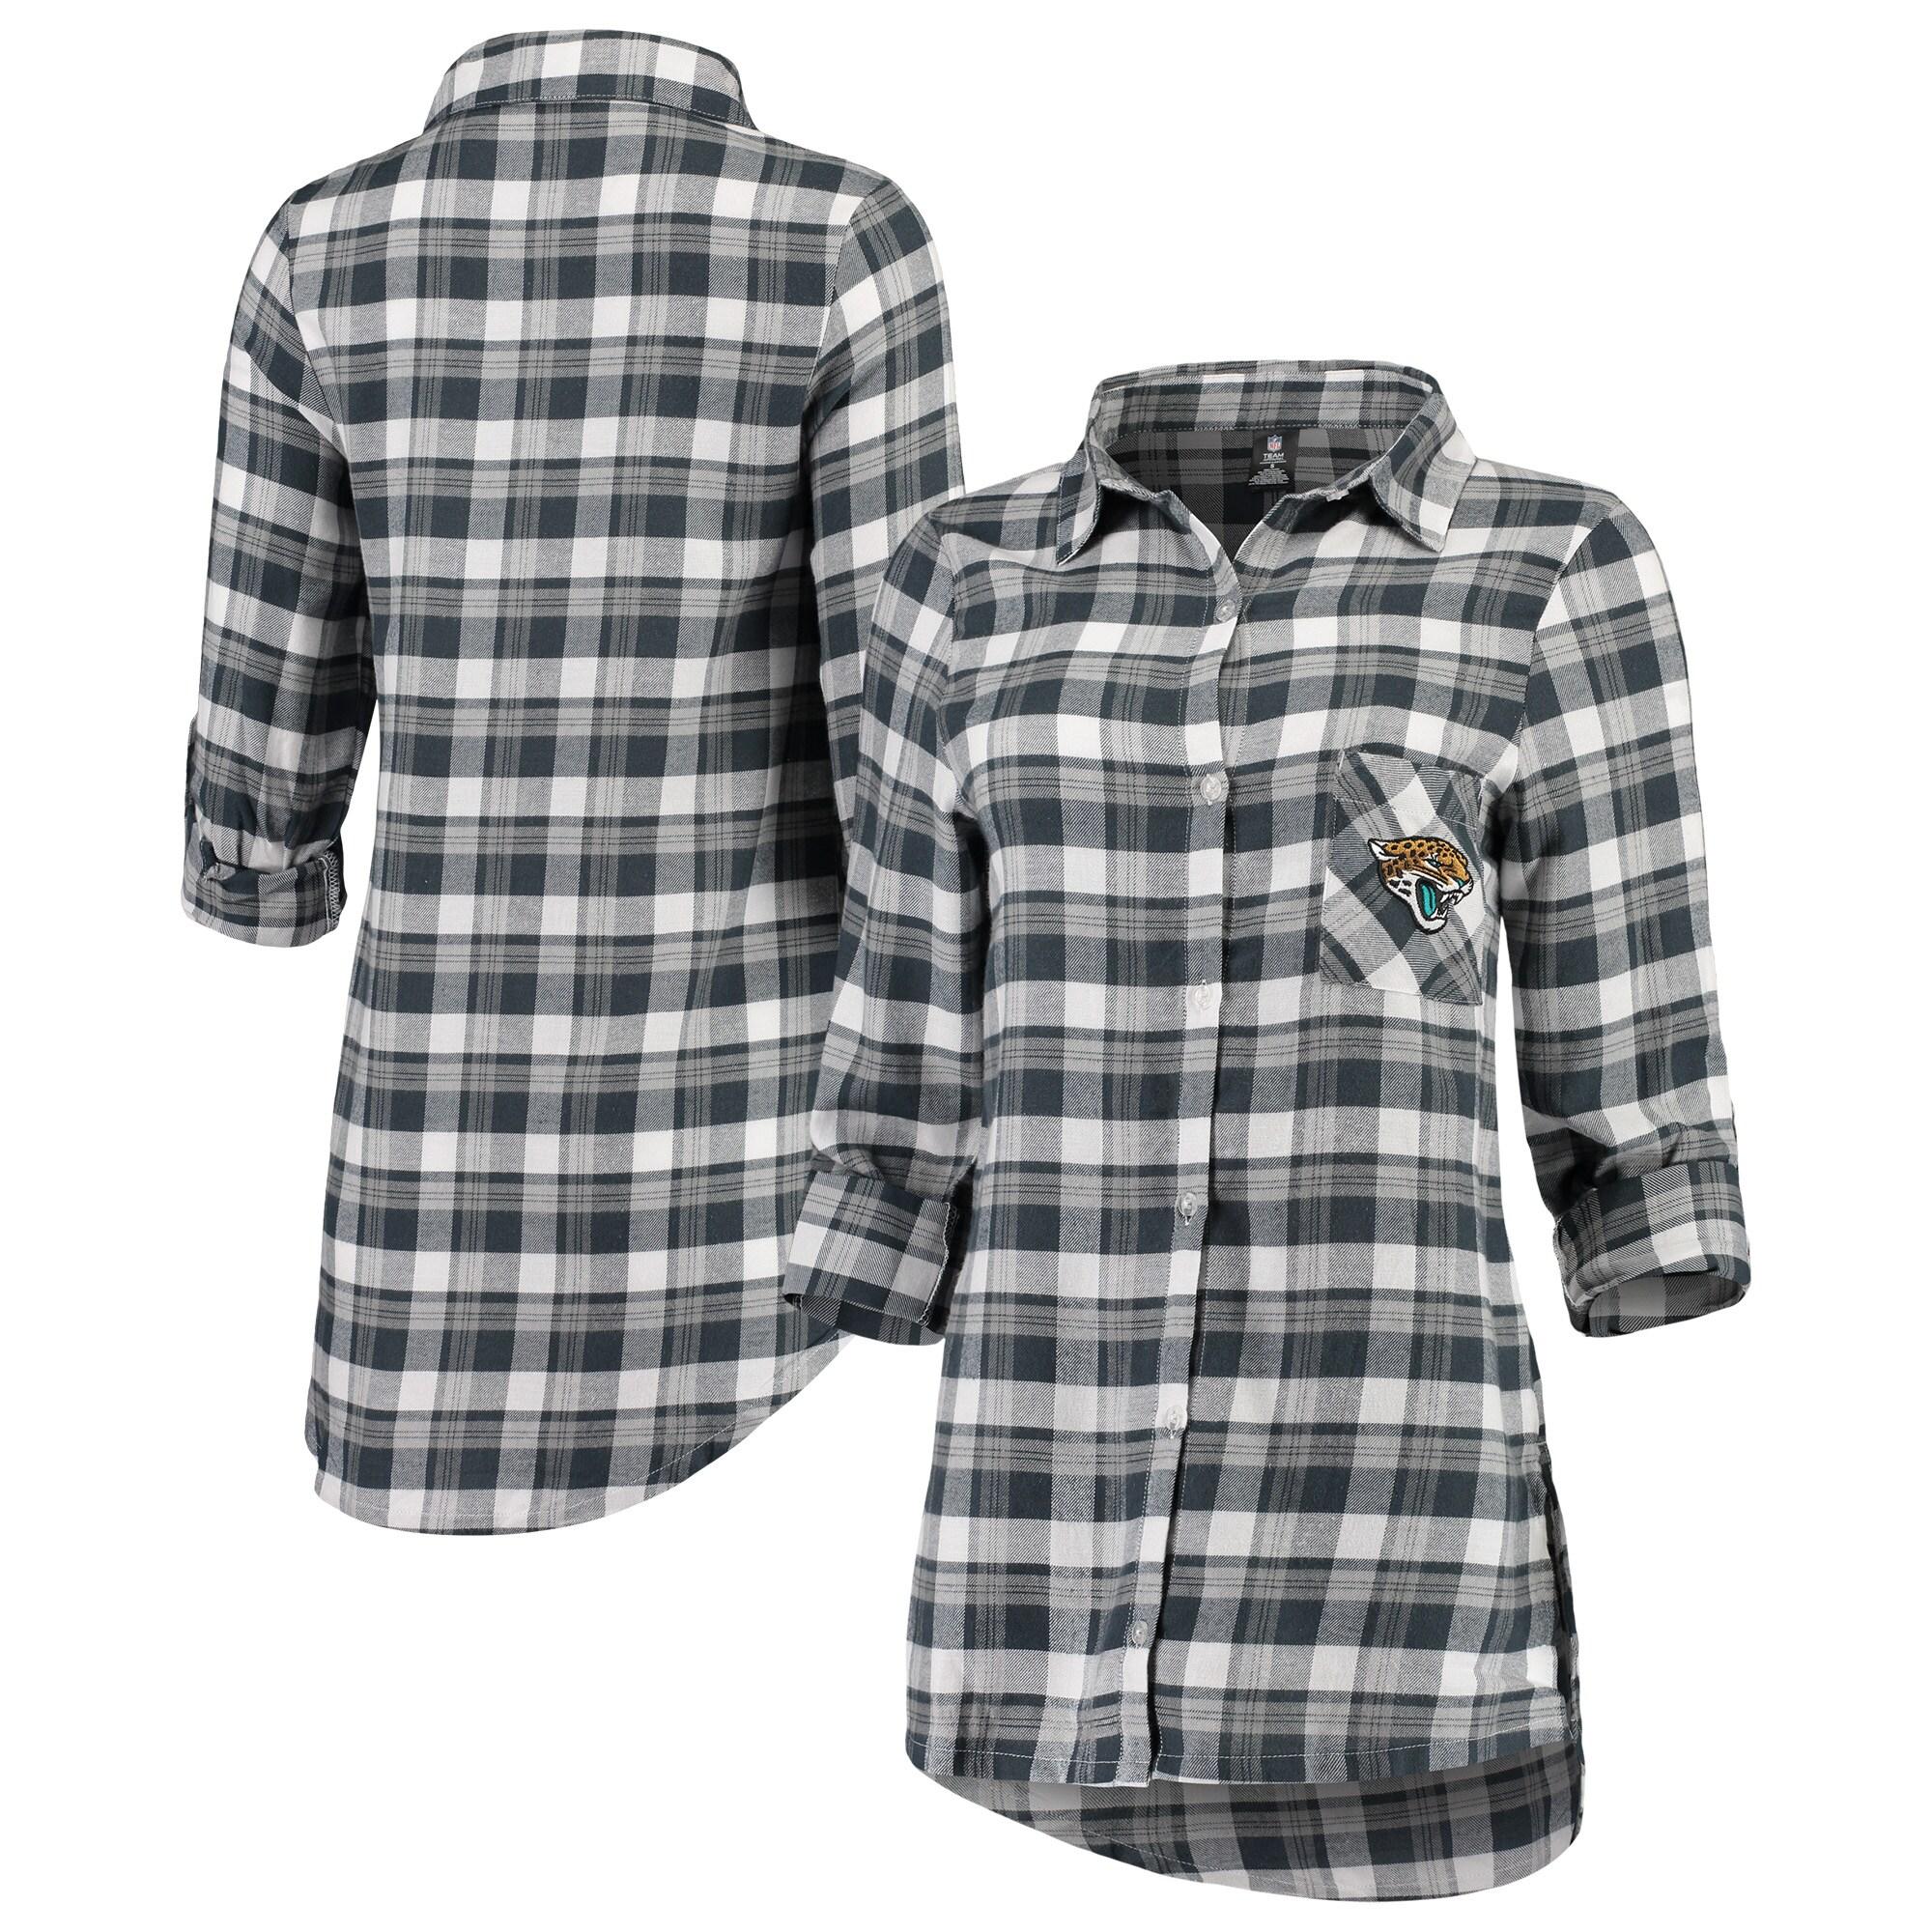 Jacksonville Jaguars Concepts Sport Women's Piedmont Flannel Button-Up Long Sleeve Shirt - Charcoal/Gray